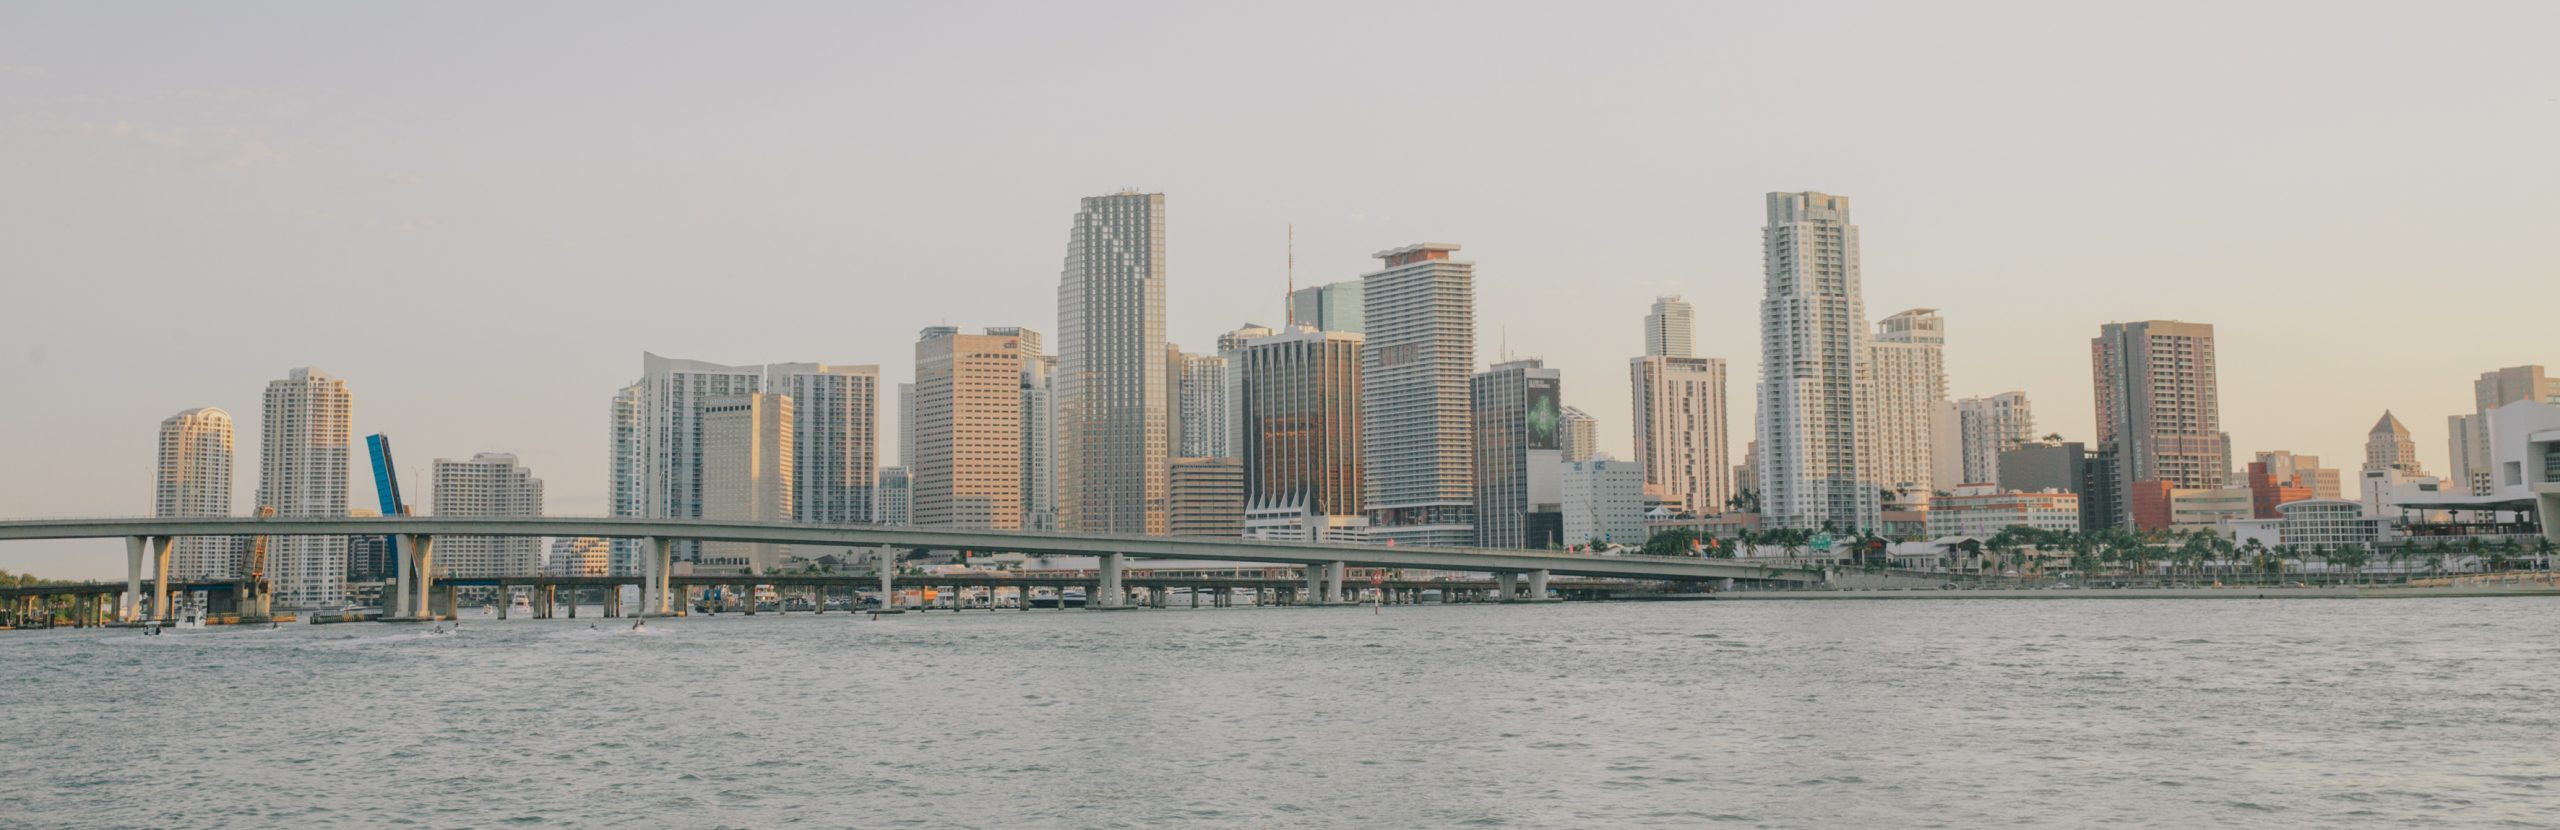 Miami photo © Marine Fonteyne